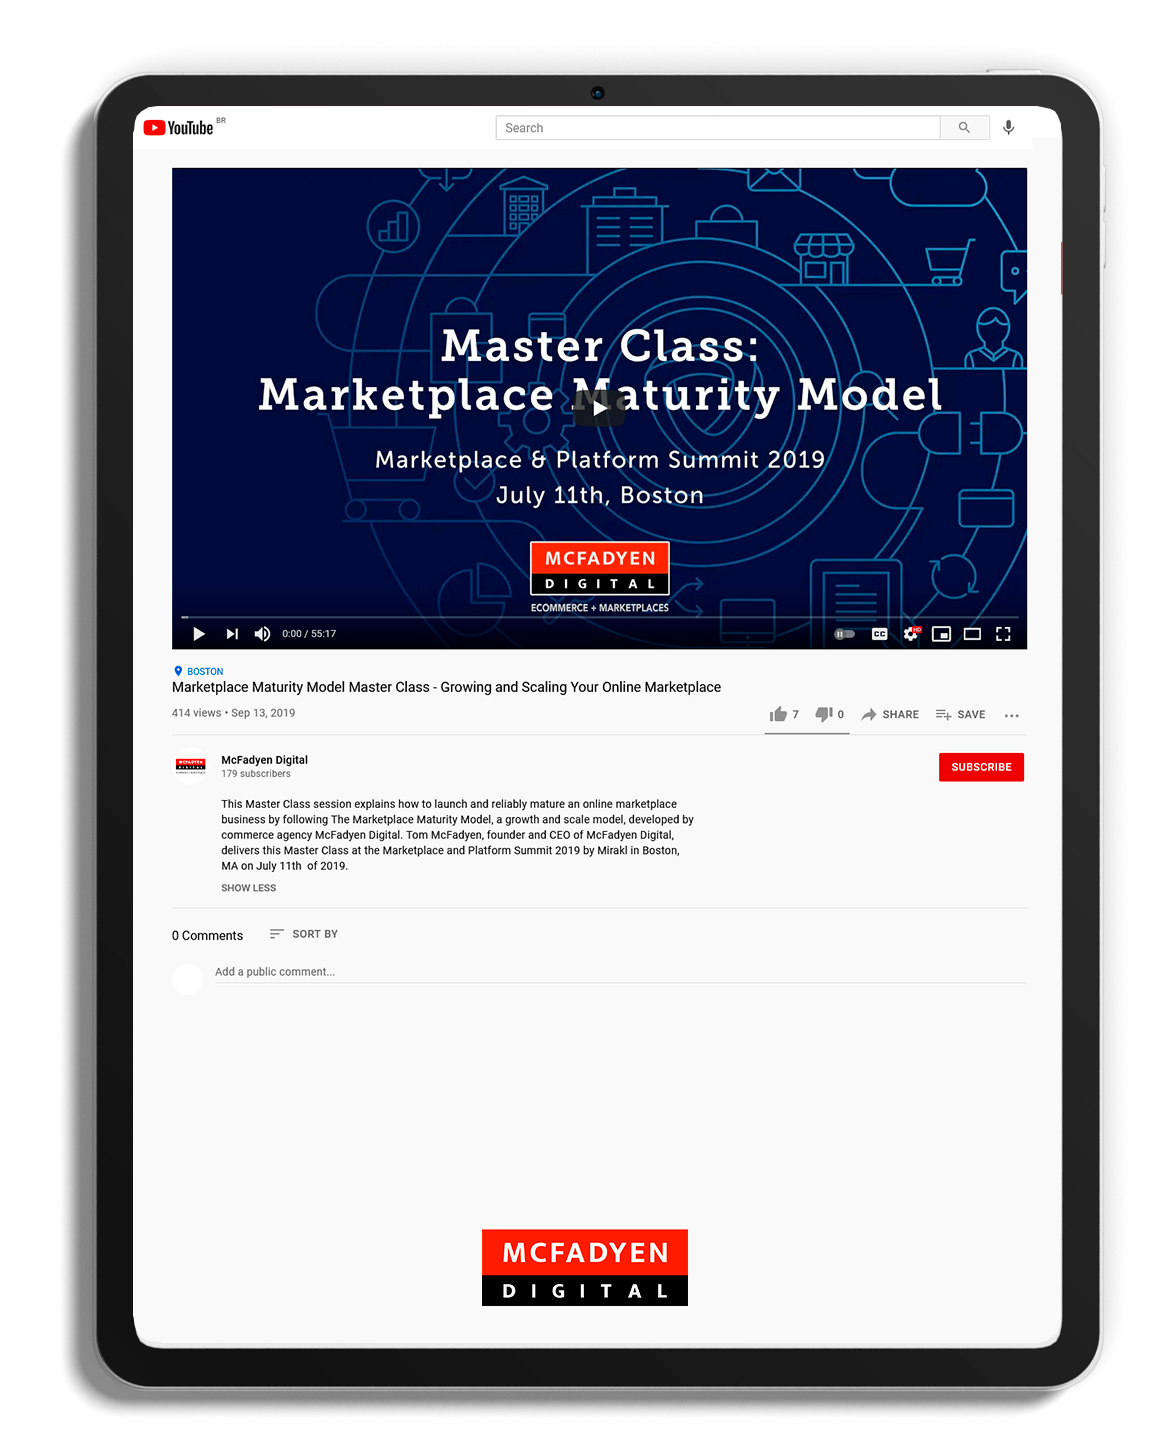 Marketplace Maturity Model Master Class